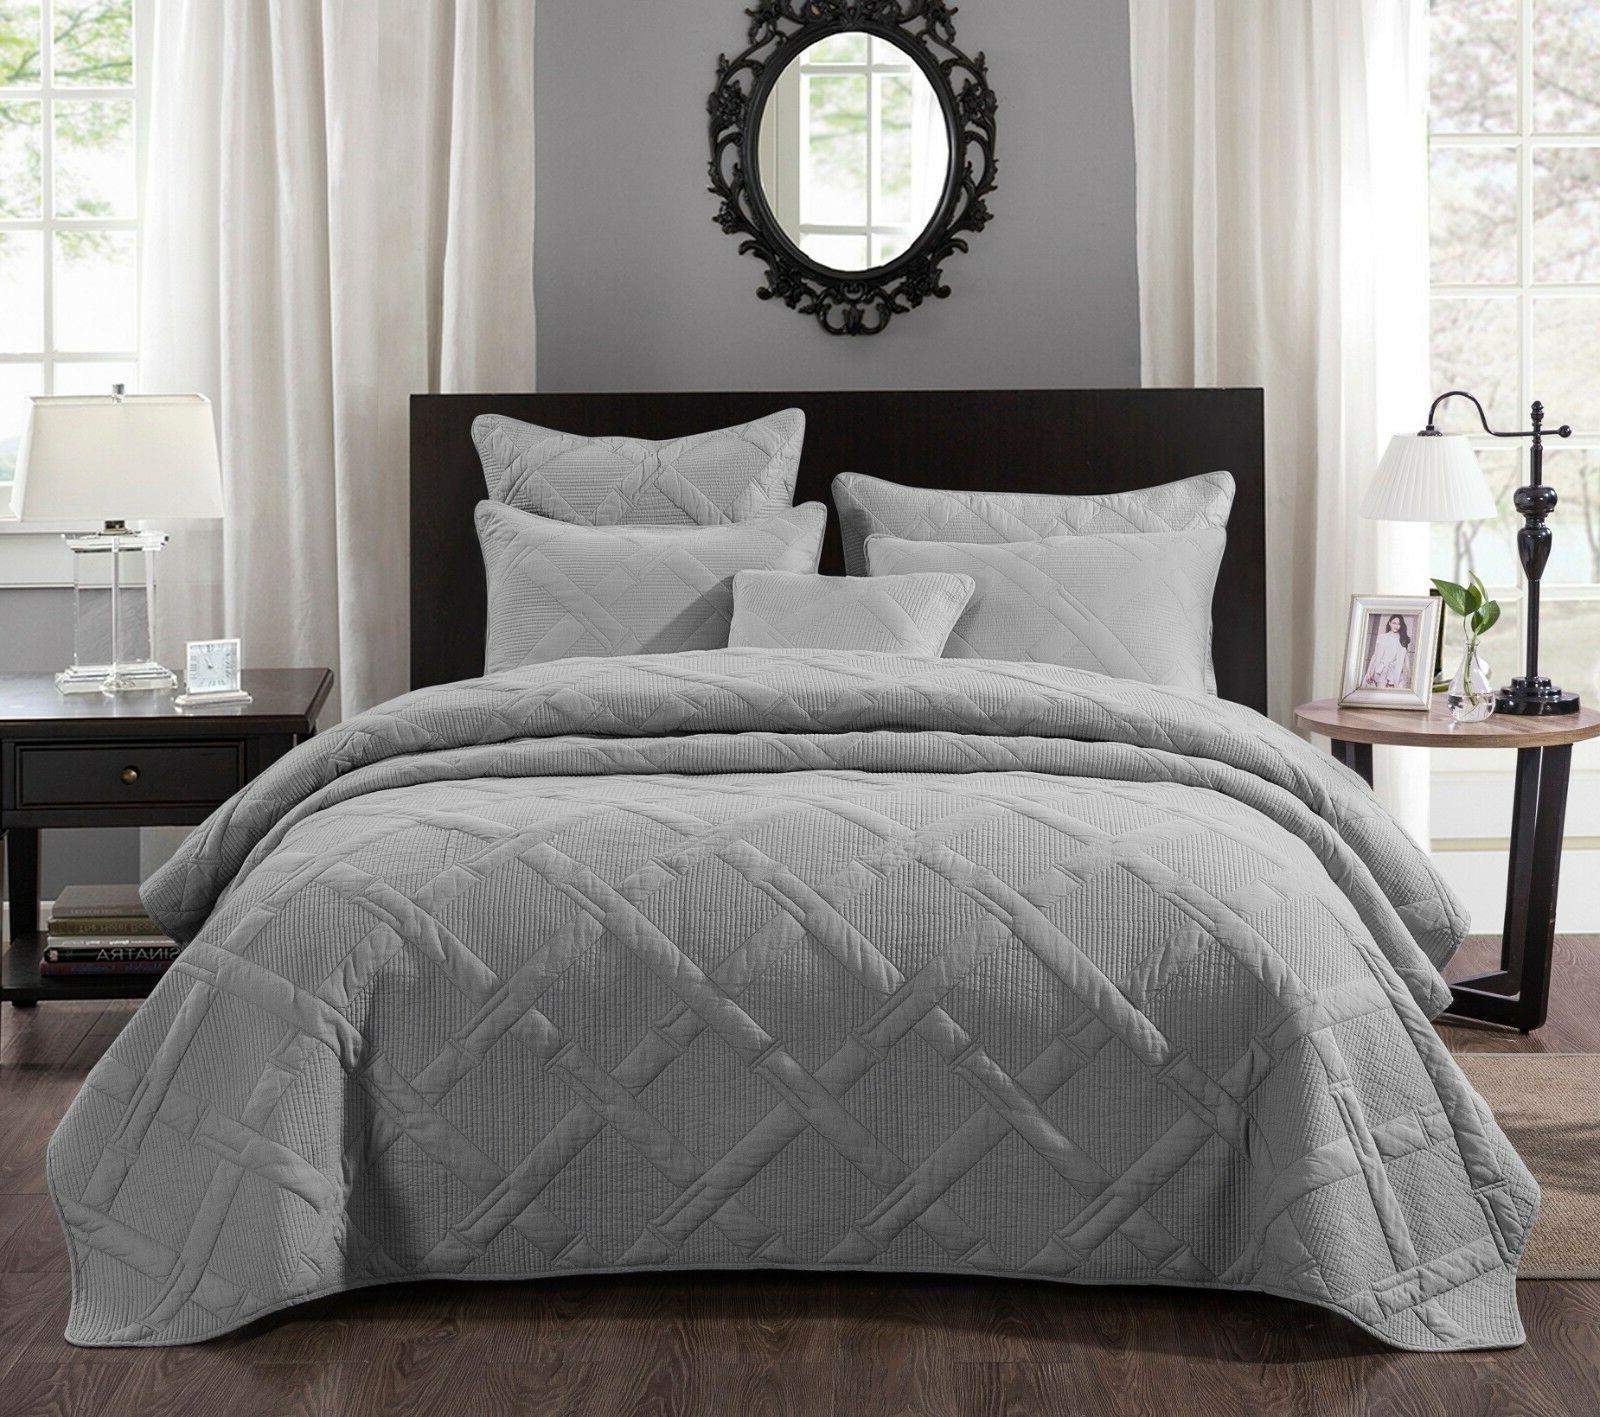 tache solid light grey silver cotton lightweight